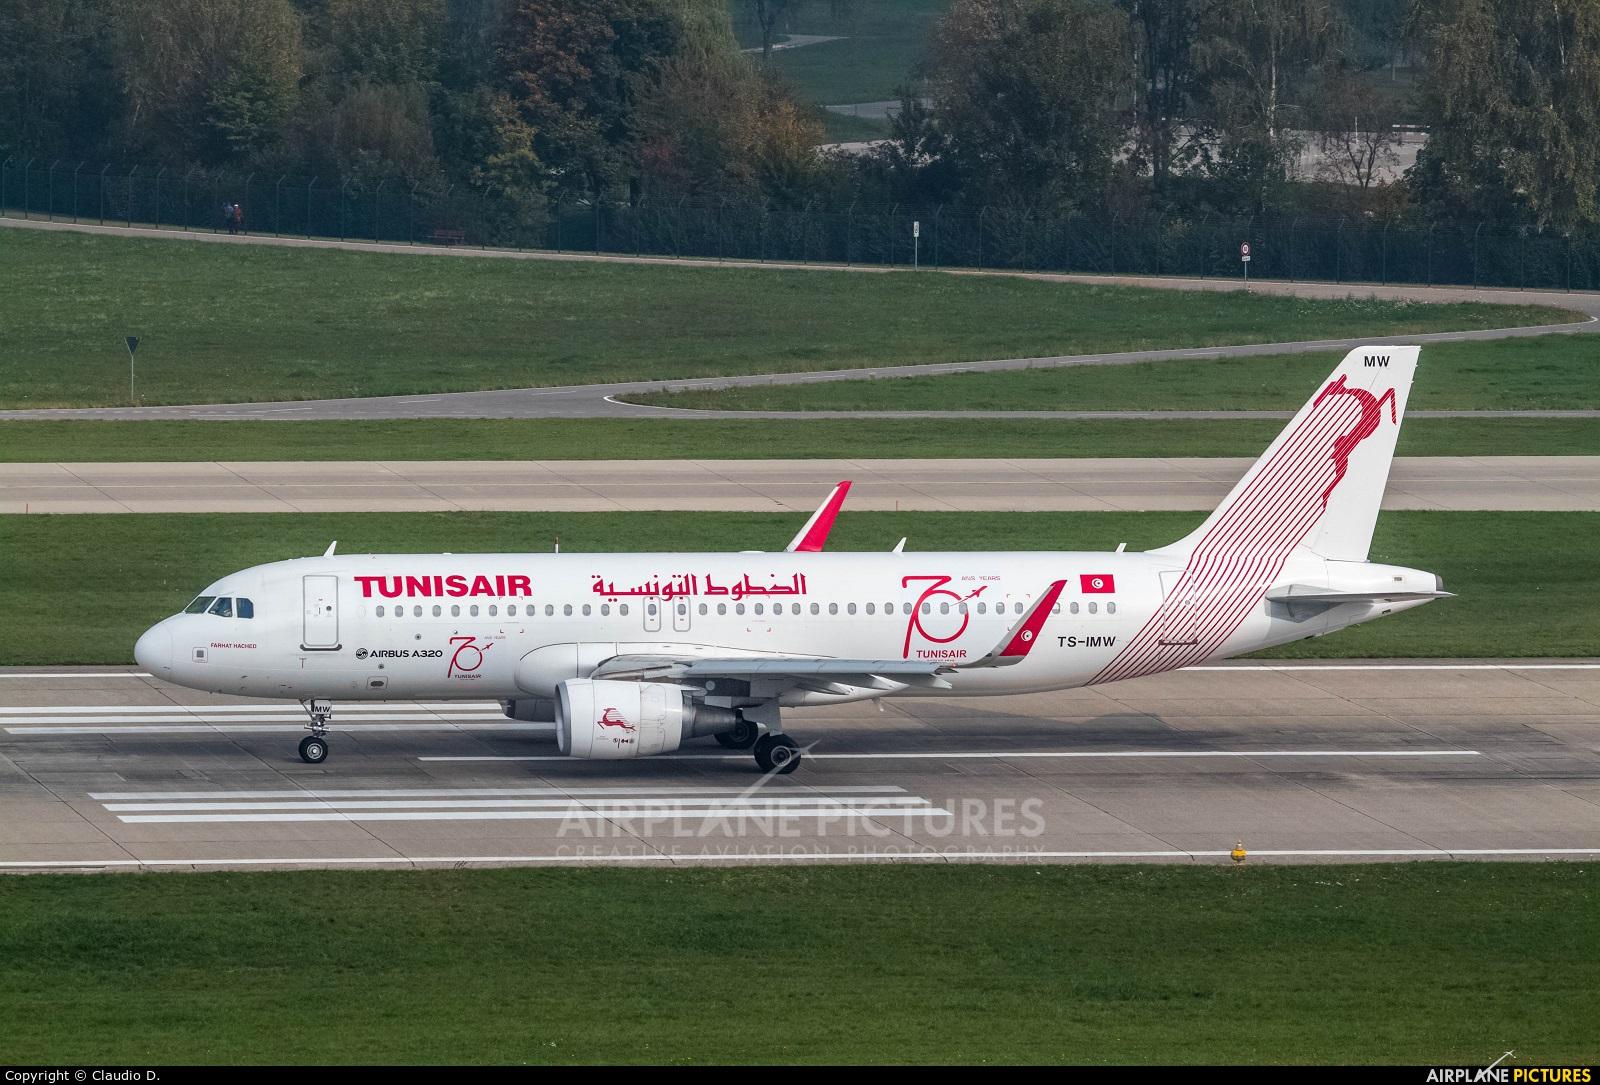 Tunisair TS-IMW aircraft at Zurich